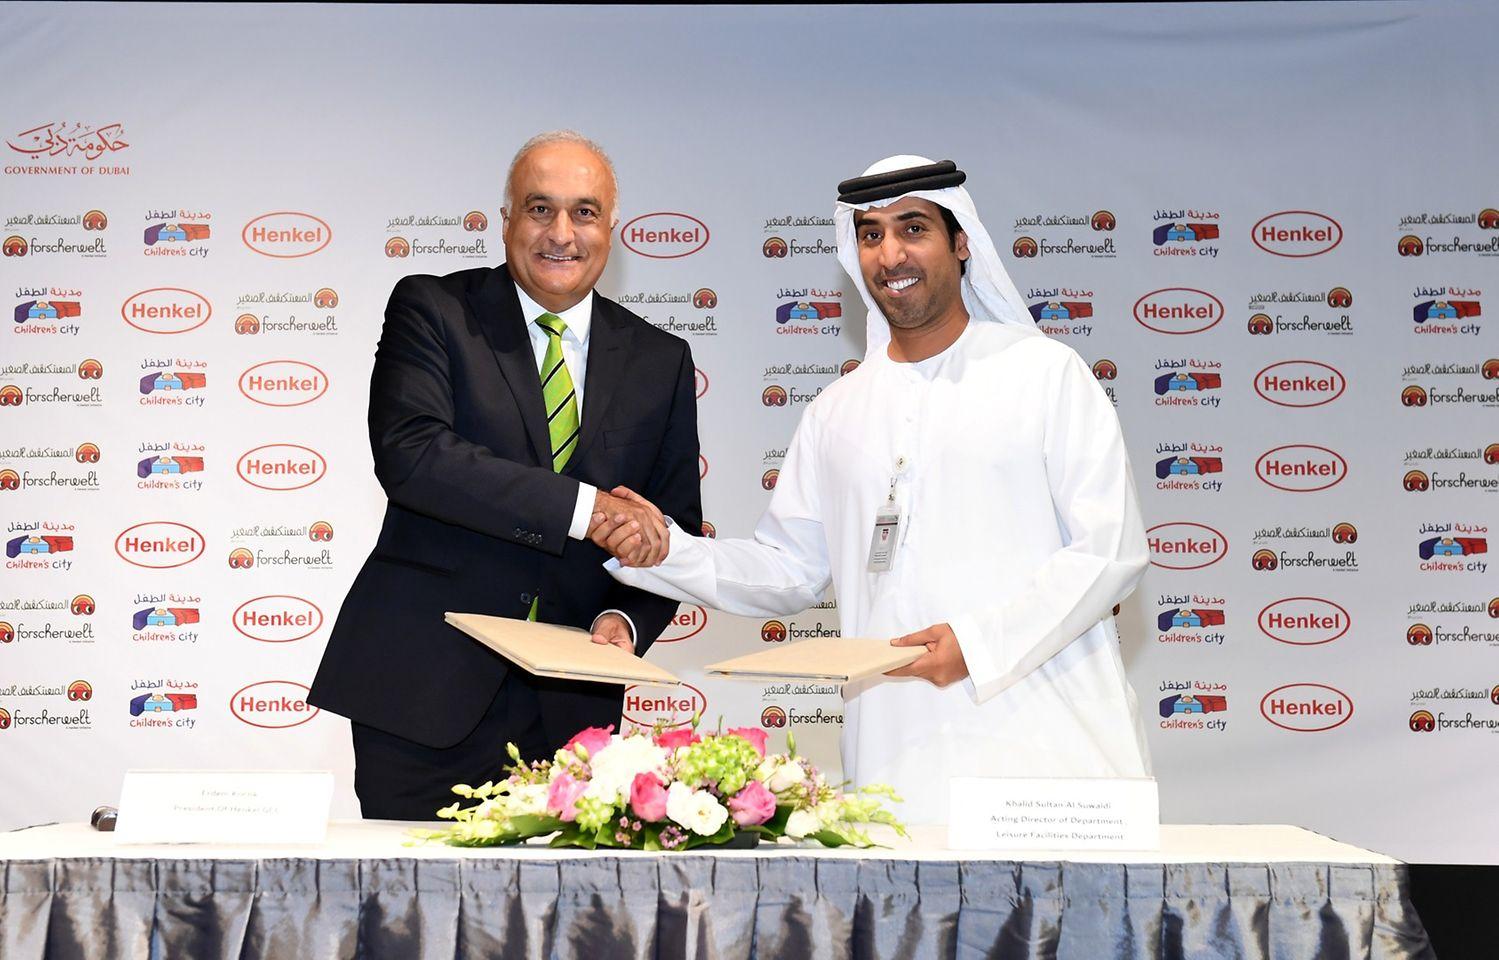 Erdem Koҫak, President of Henkel GCC; Khalid Sultan Hilal Humaid Alsuwaidi, Acting Director of Department, Leisure Facilities Department